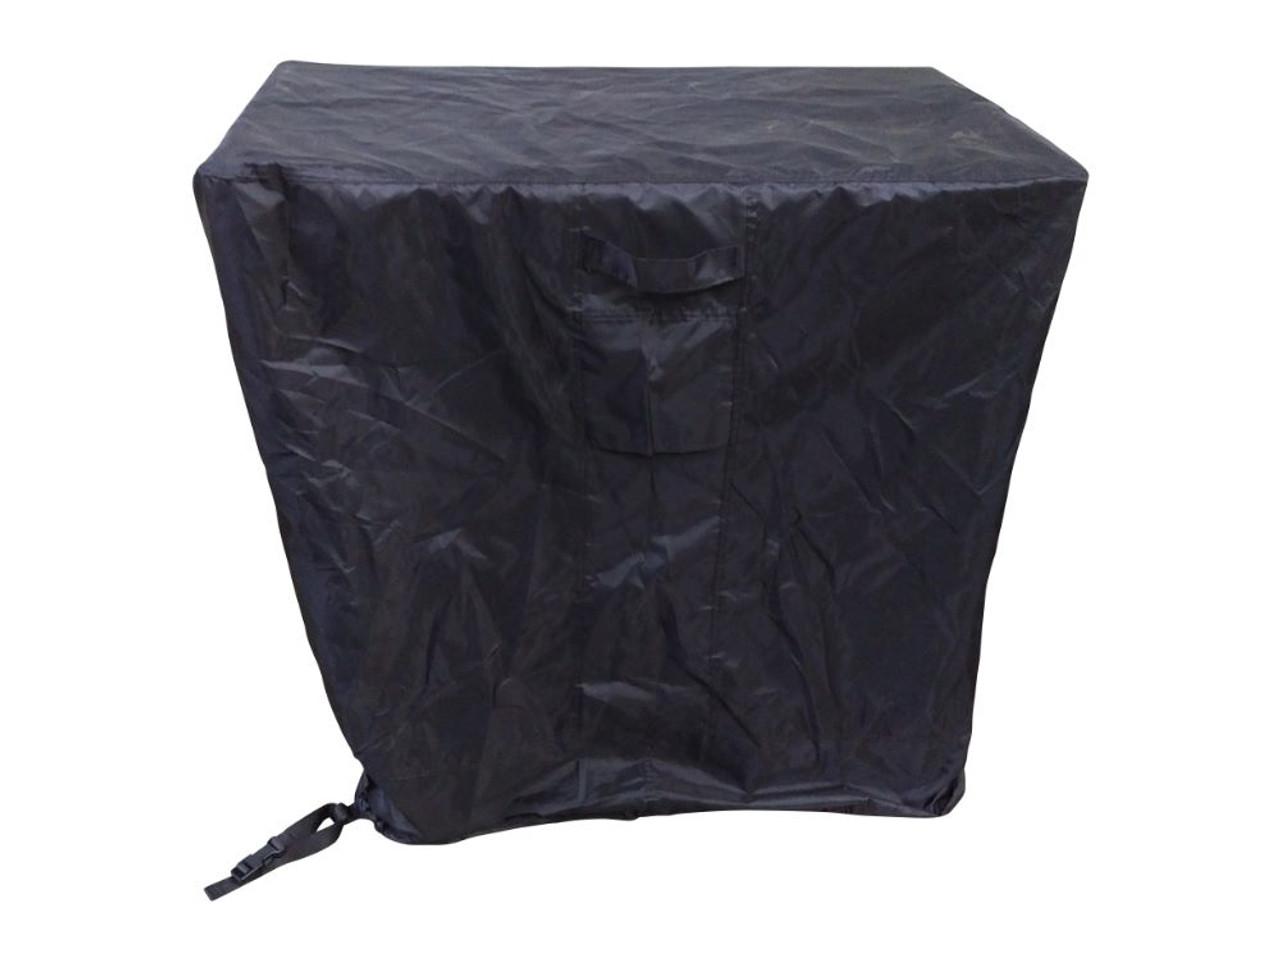 Table Saw Cover, Large (66Wx36Dx36H) (Advantage #51175)